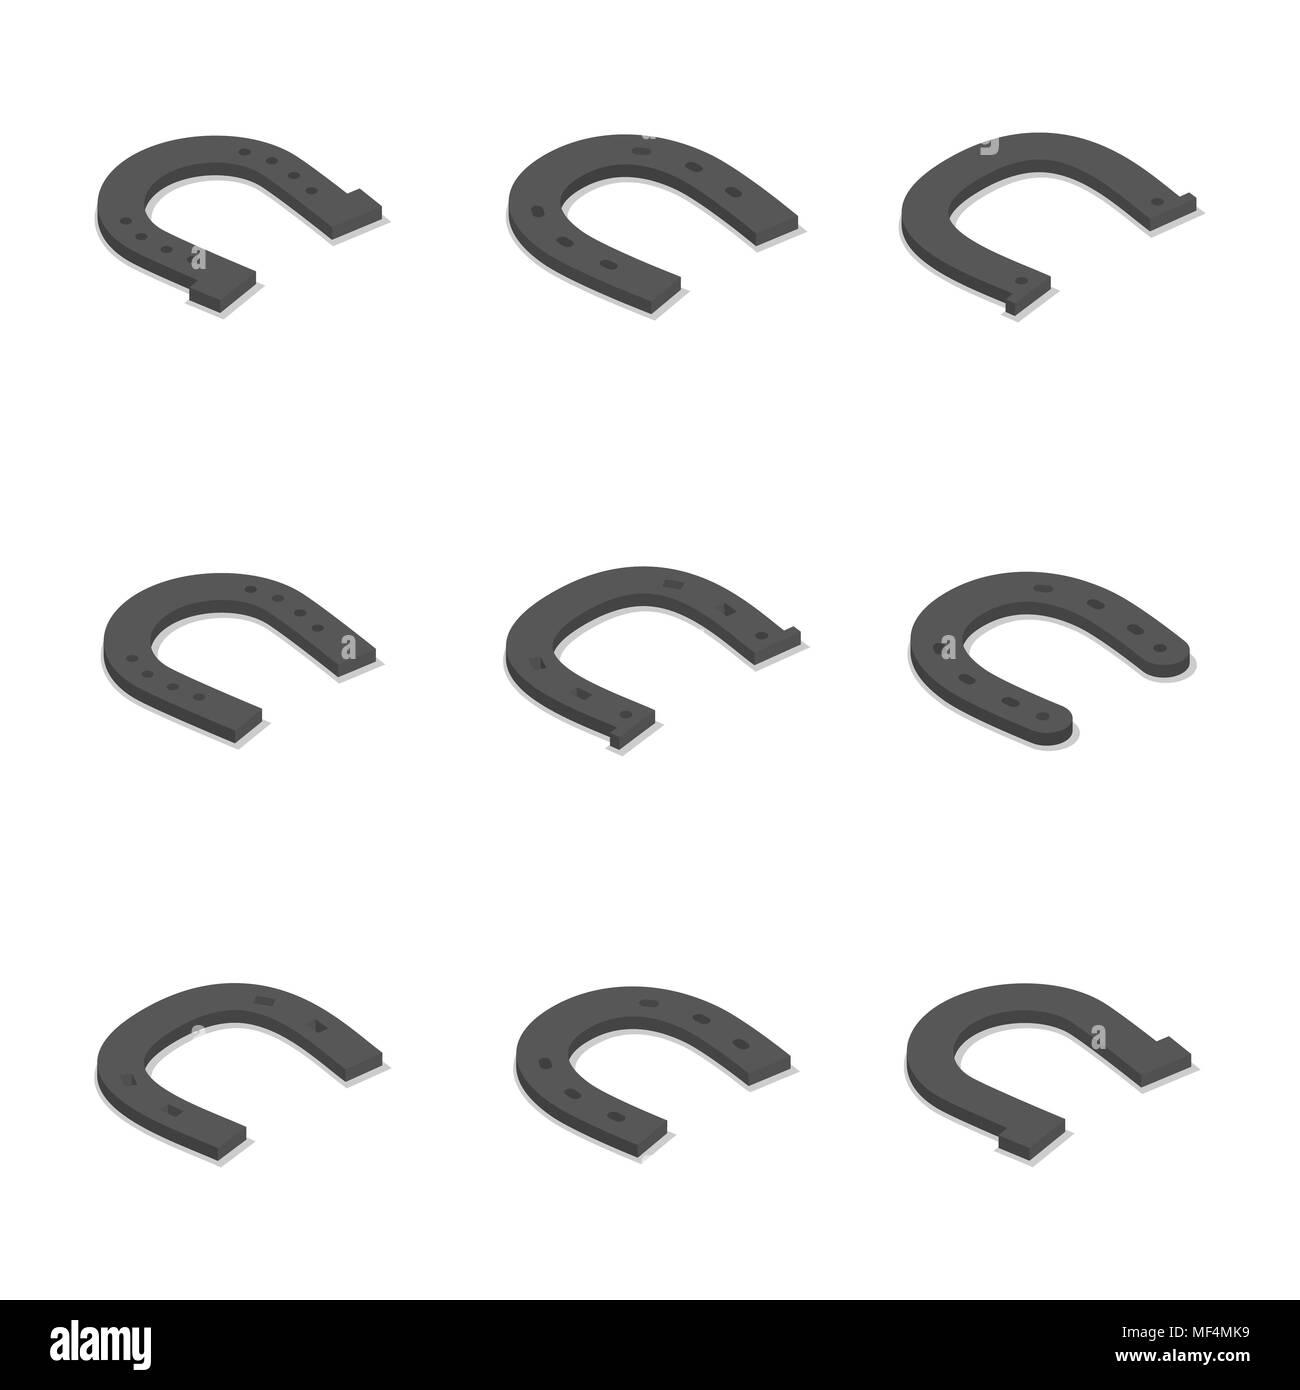 Set of different horseshoes isolated on white background. Flat 3D isometric style, vector illustration - Stock Image